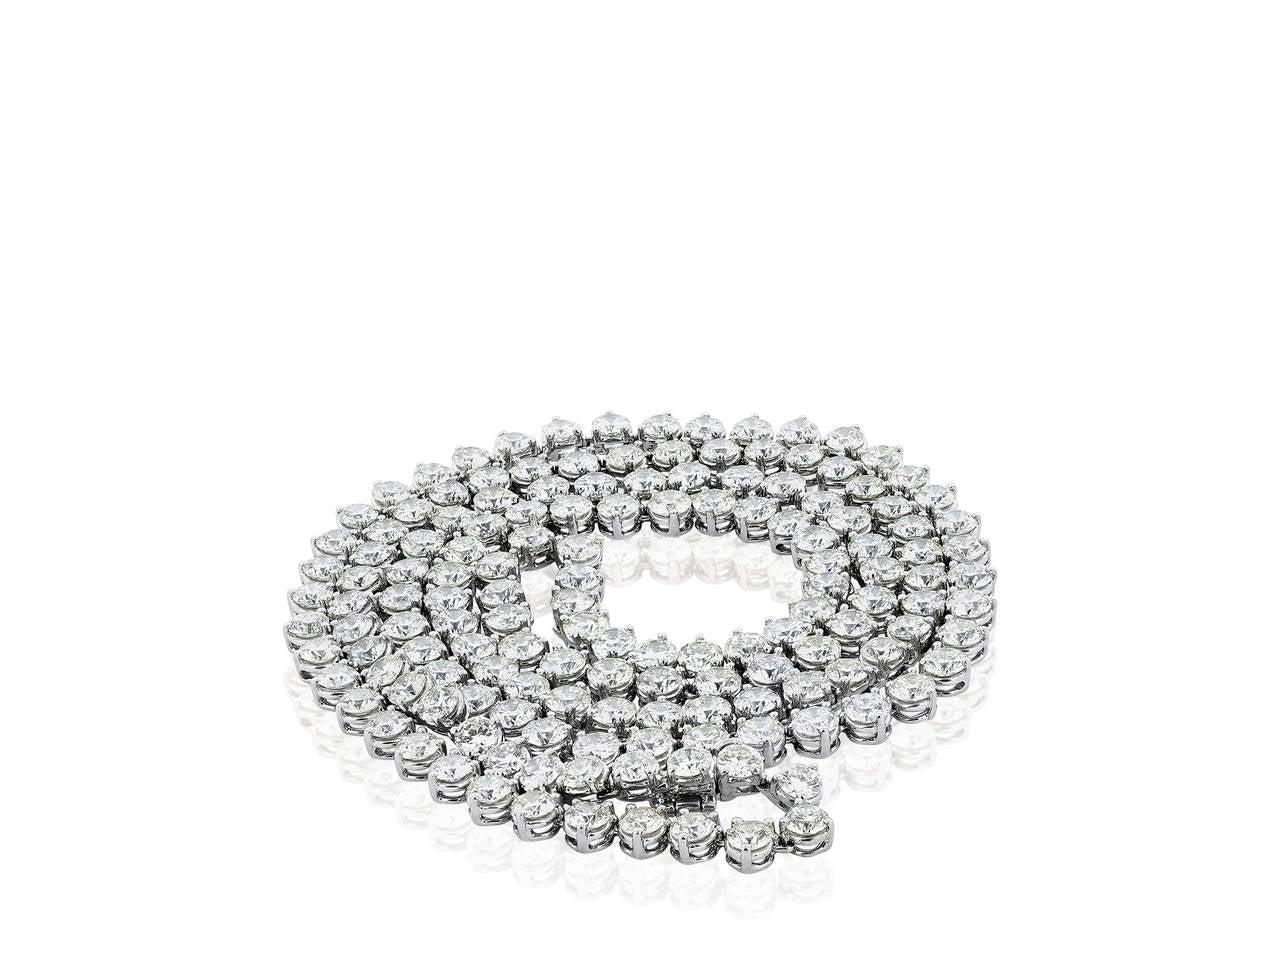 46 Carat Opera Length Diamond Platinum Necklace 4